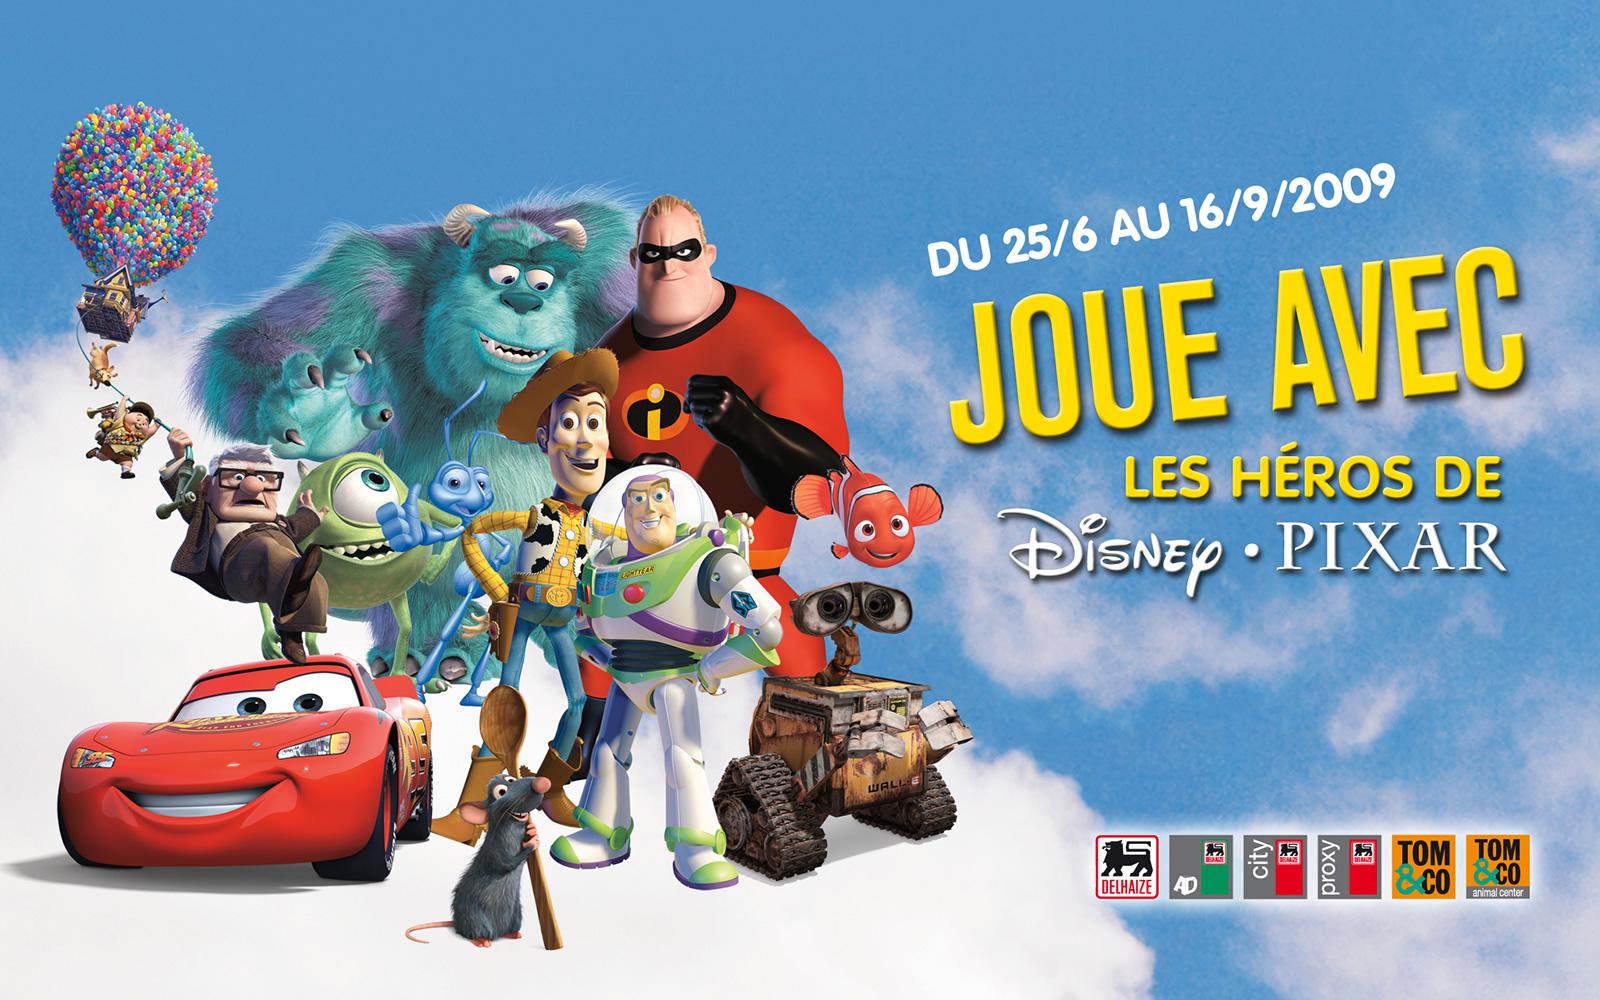 Delhaize – Disney Pixar